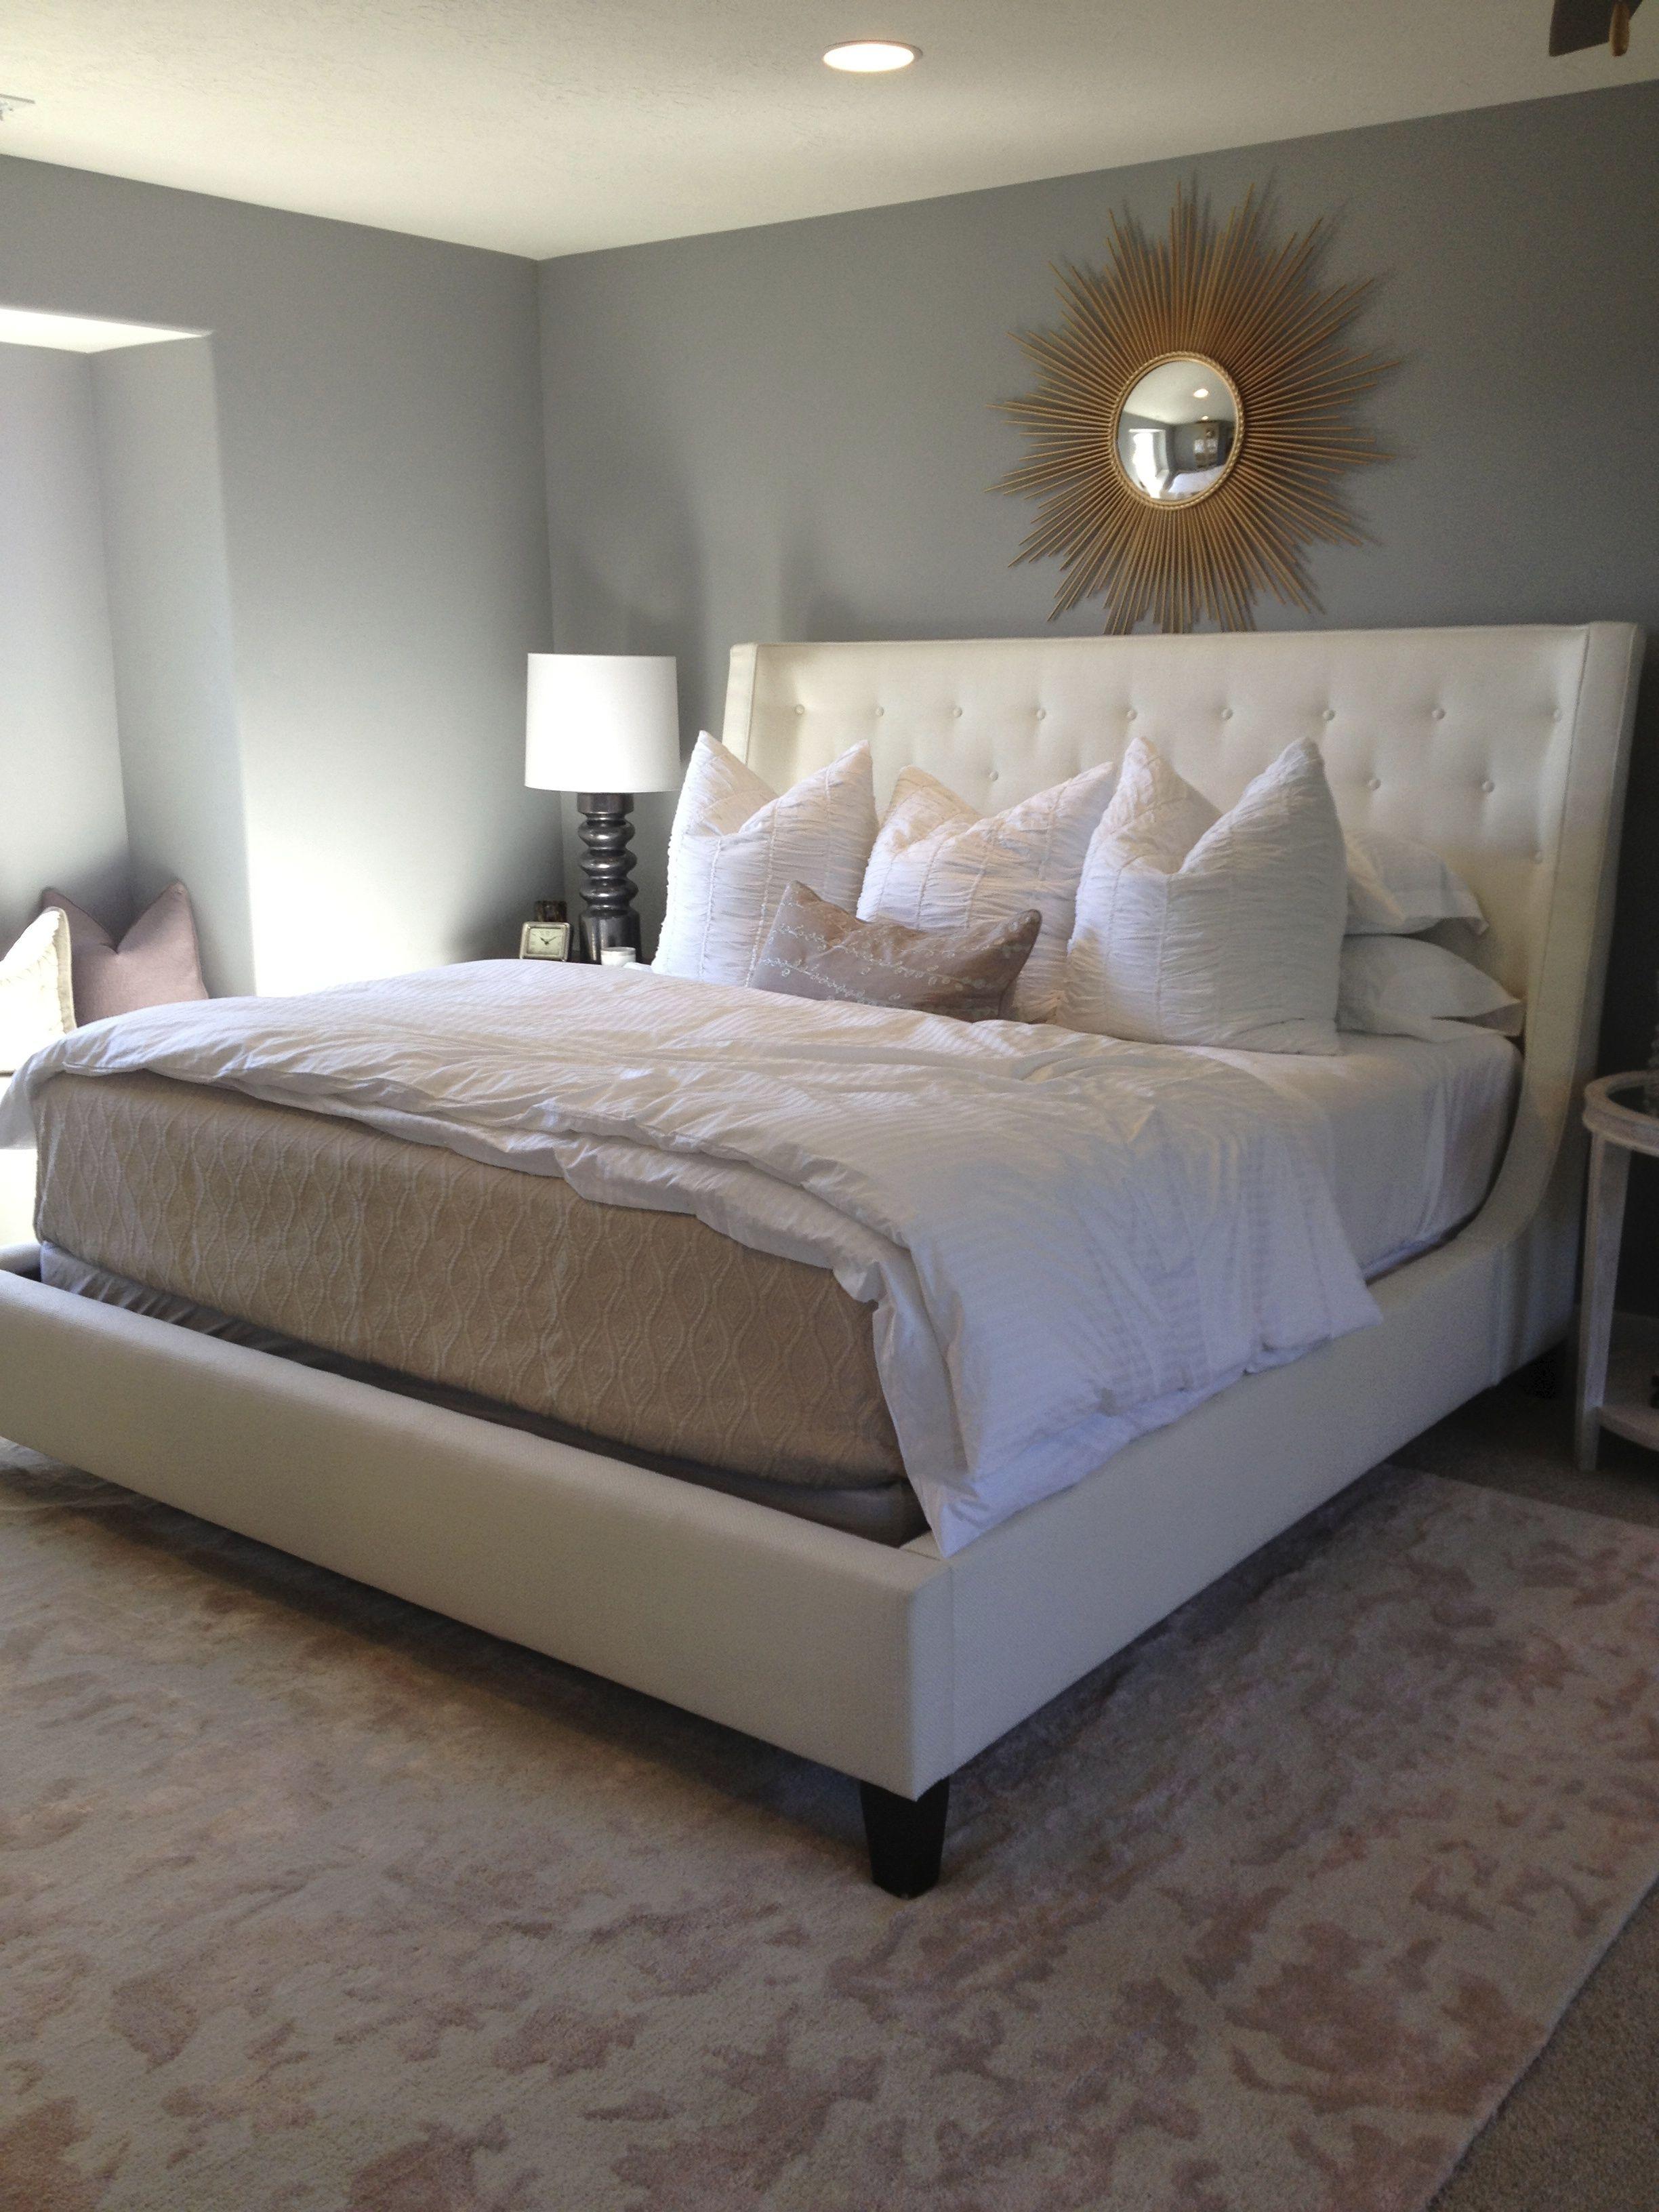 Upholstered King Bed Upholstered King Bed Frame